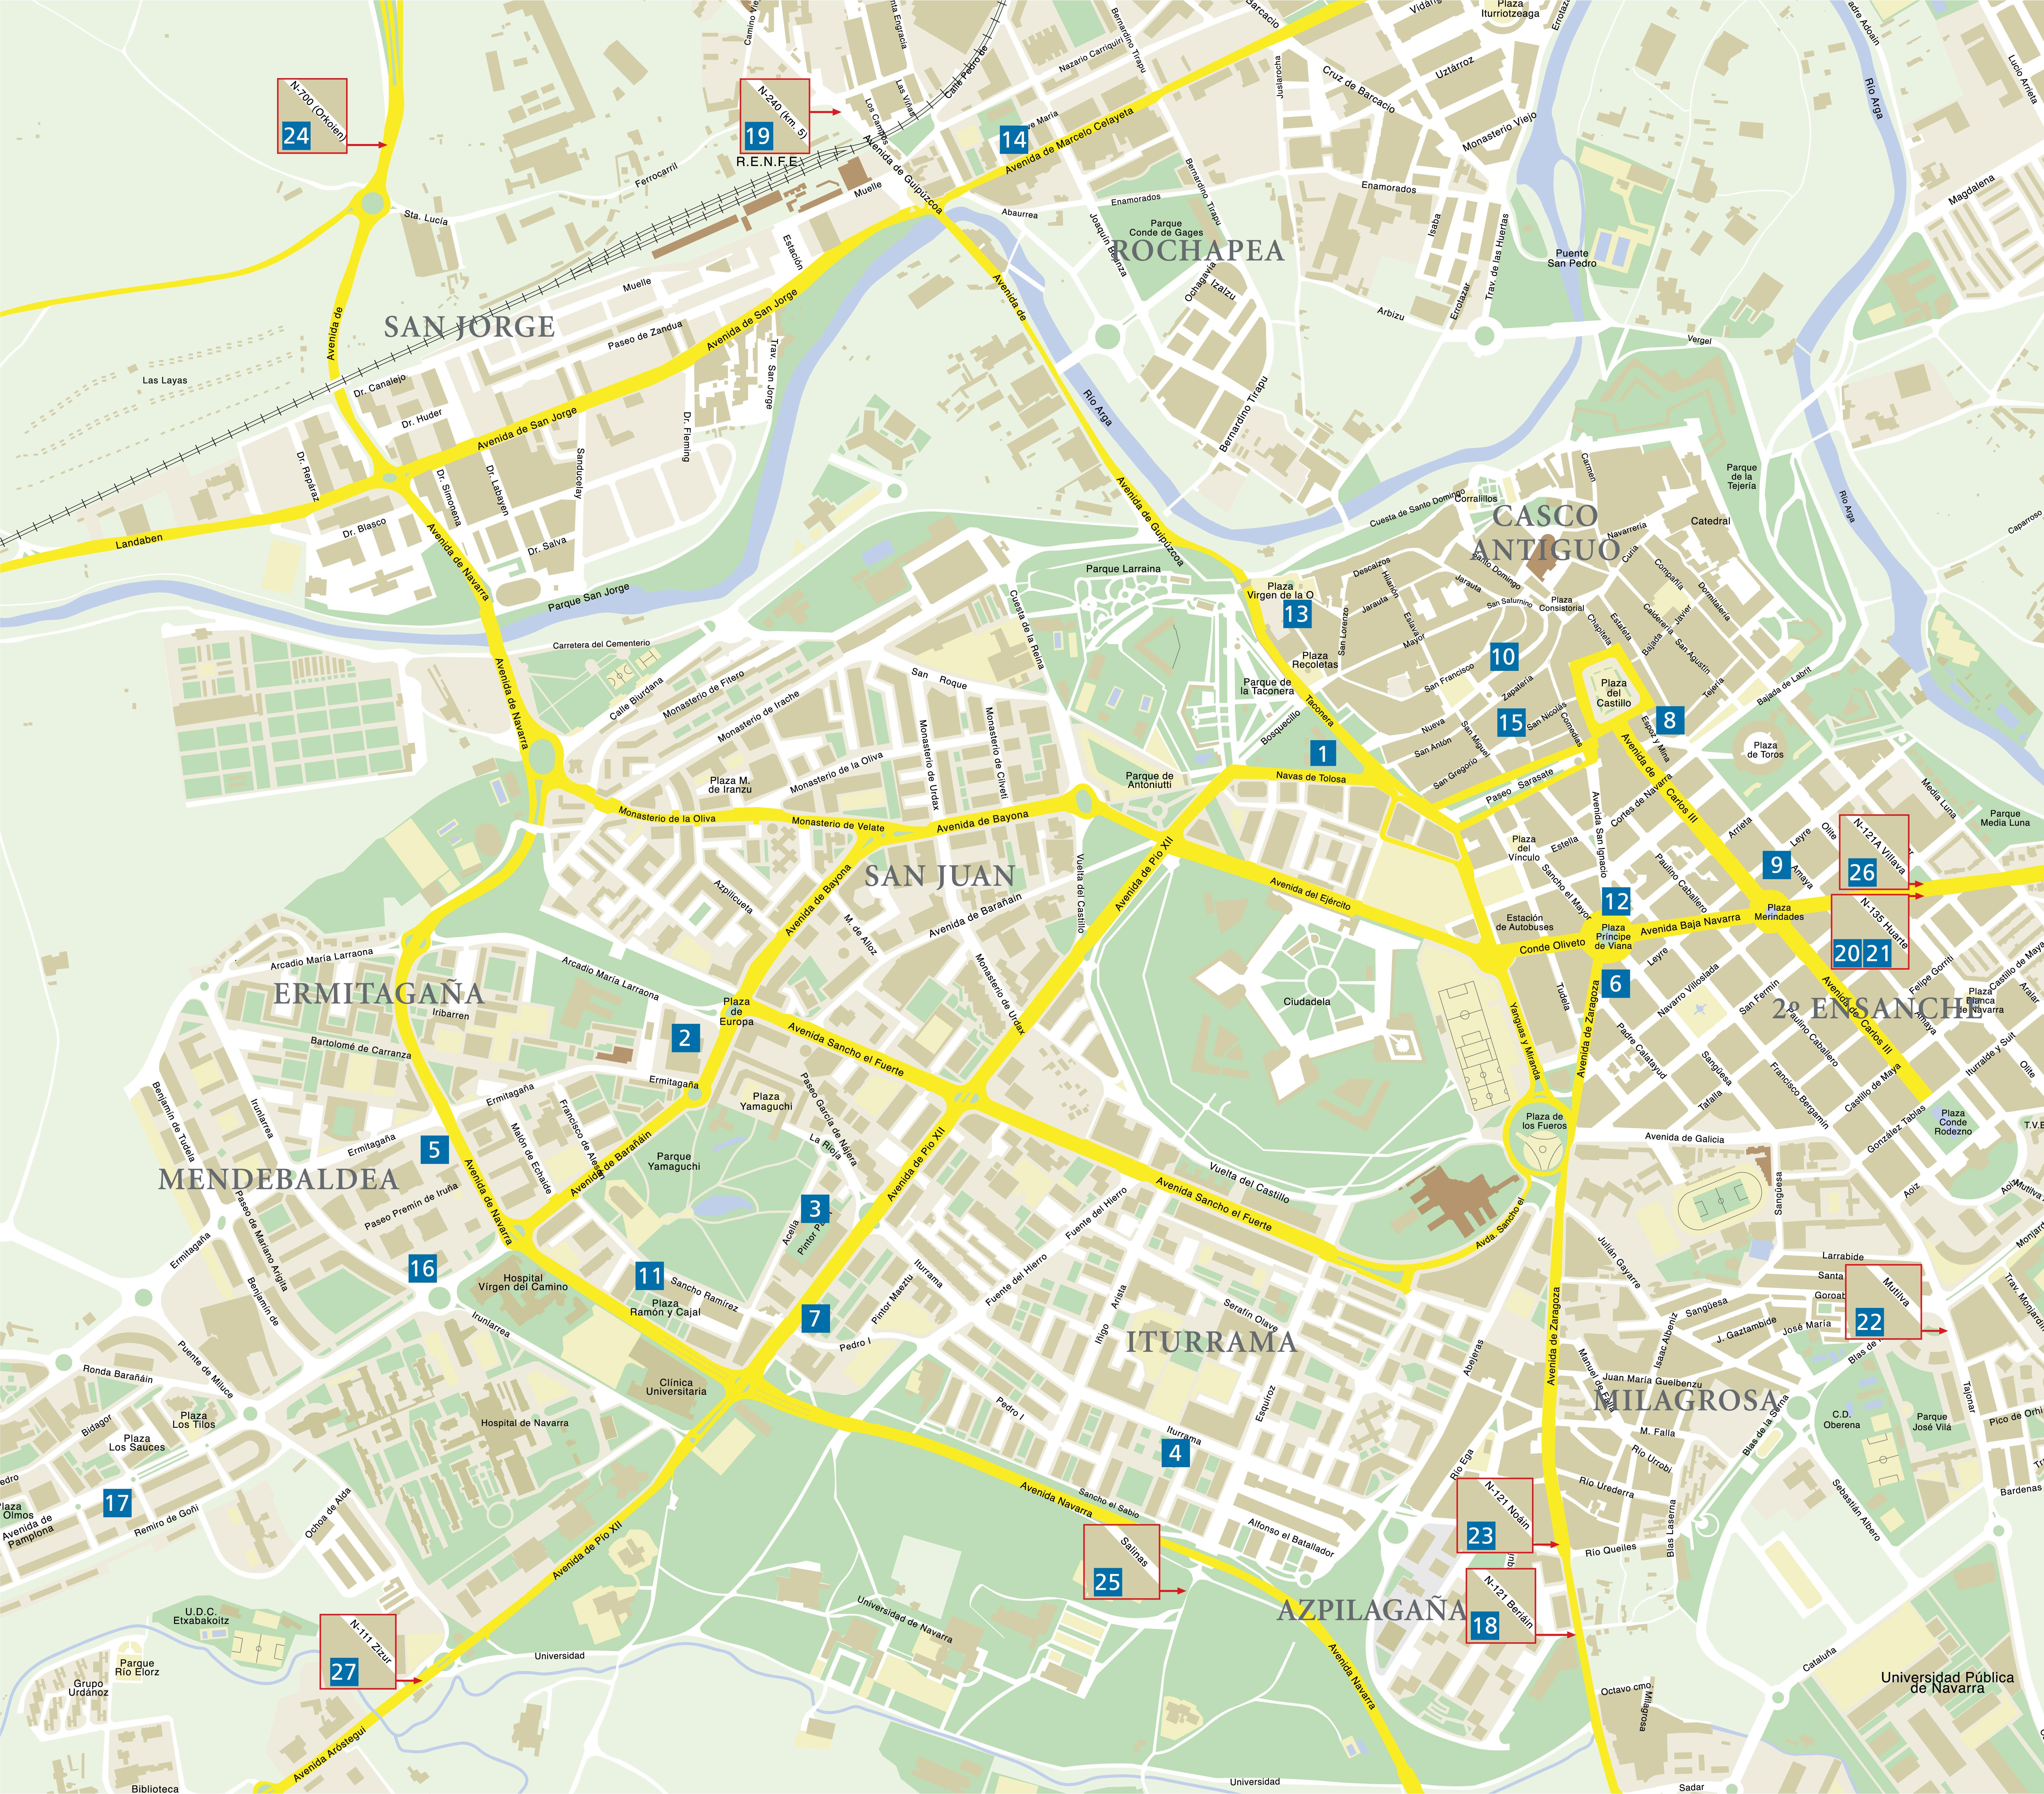 Map of Pamplona